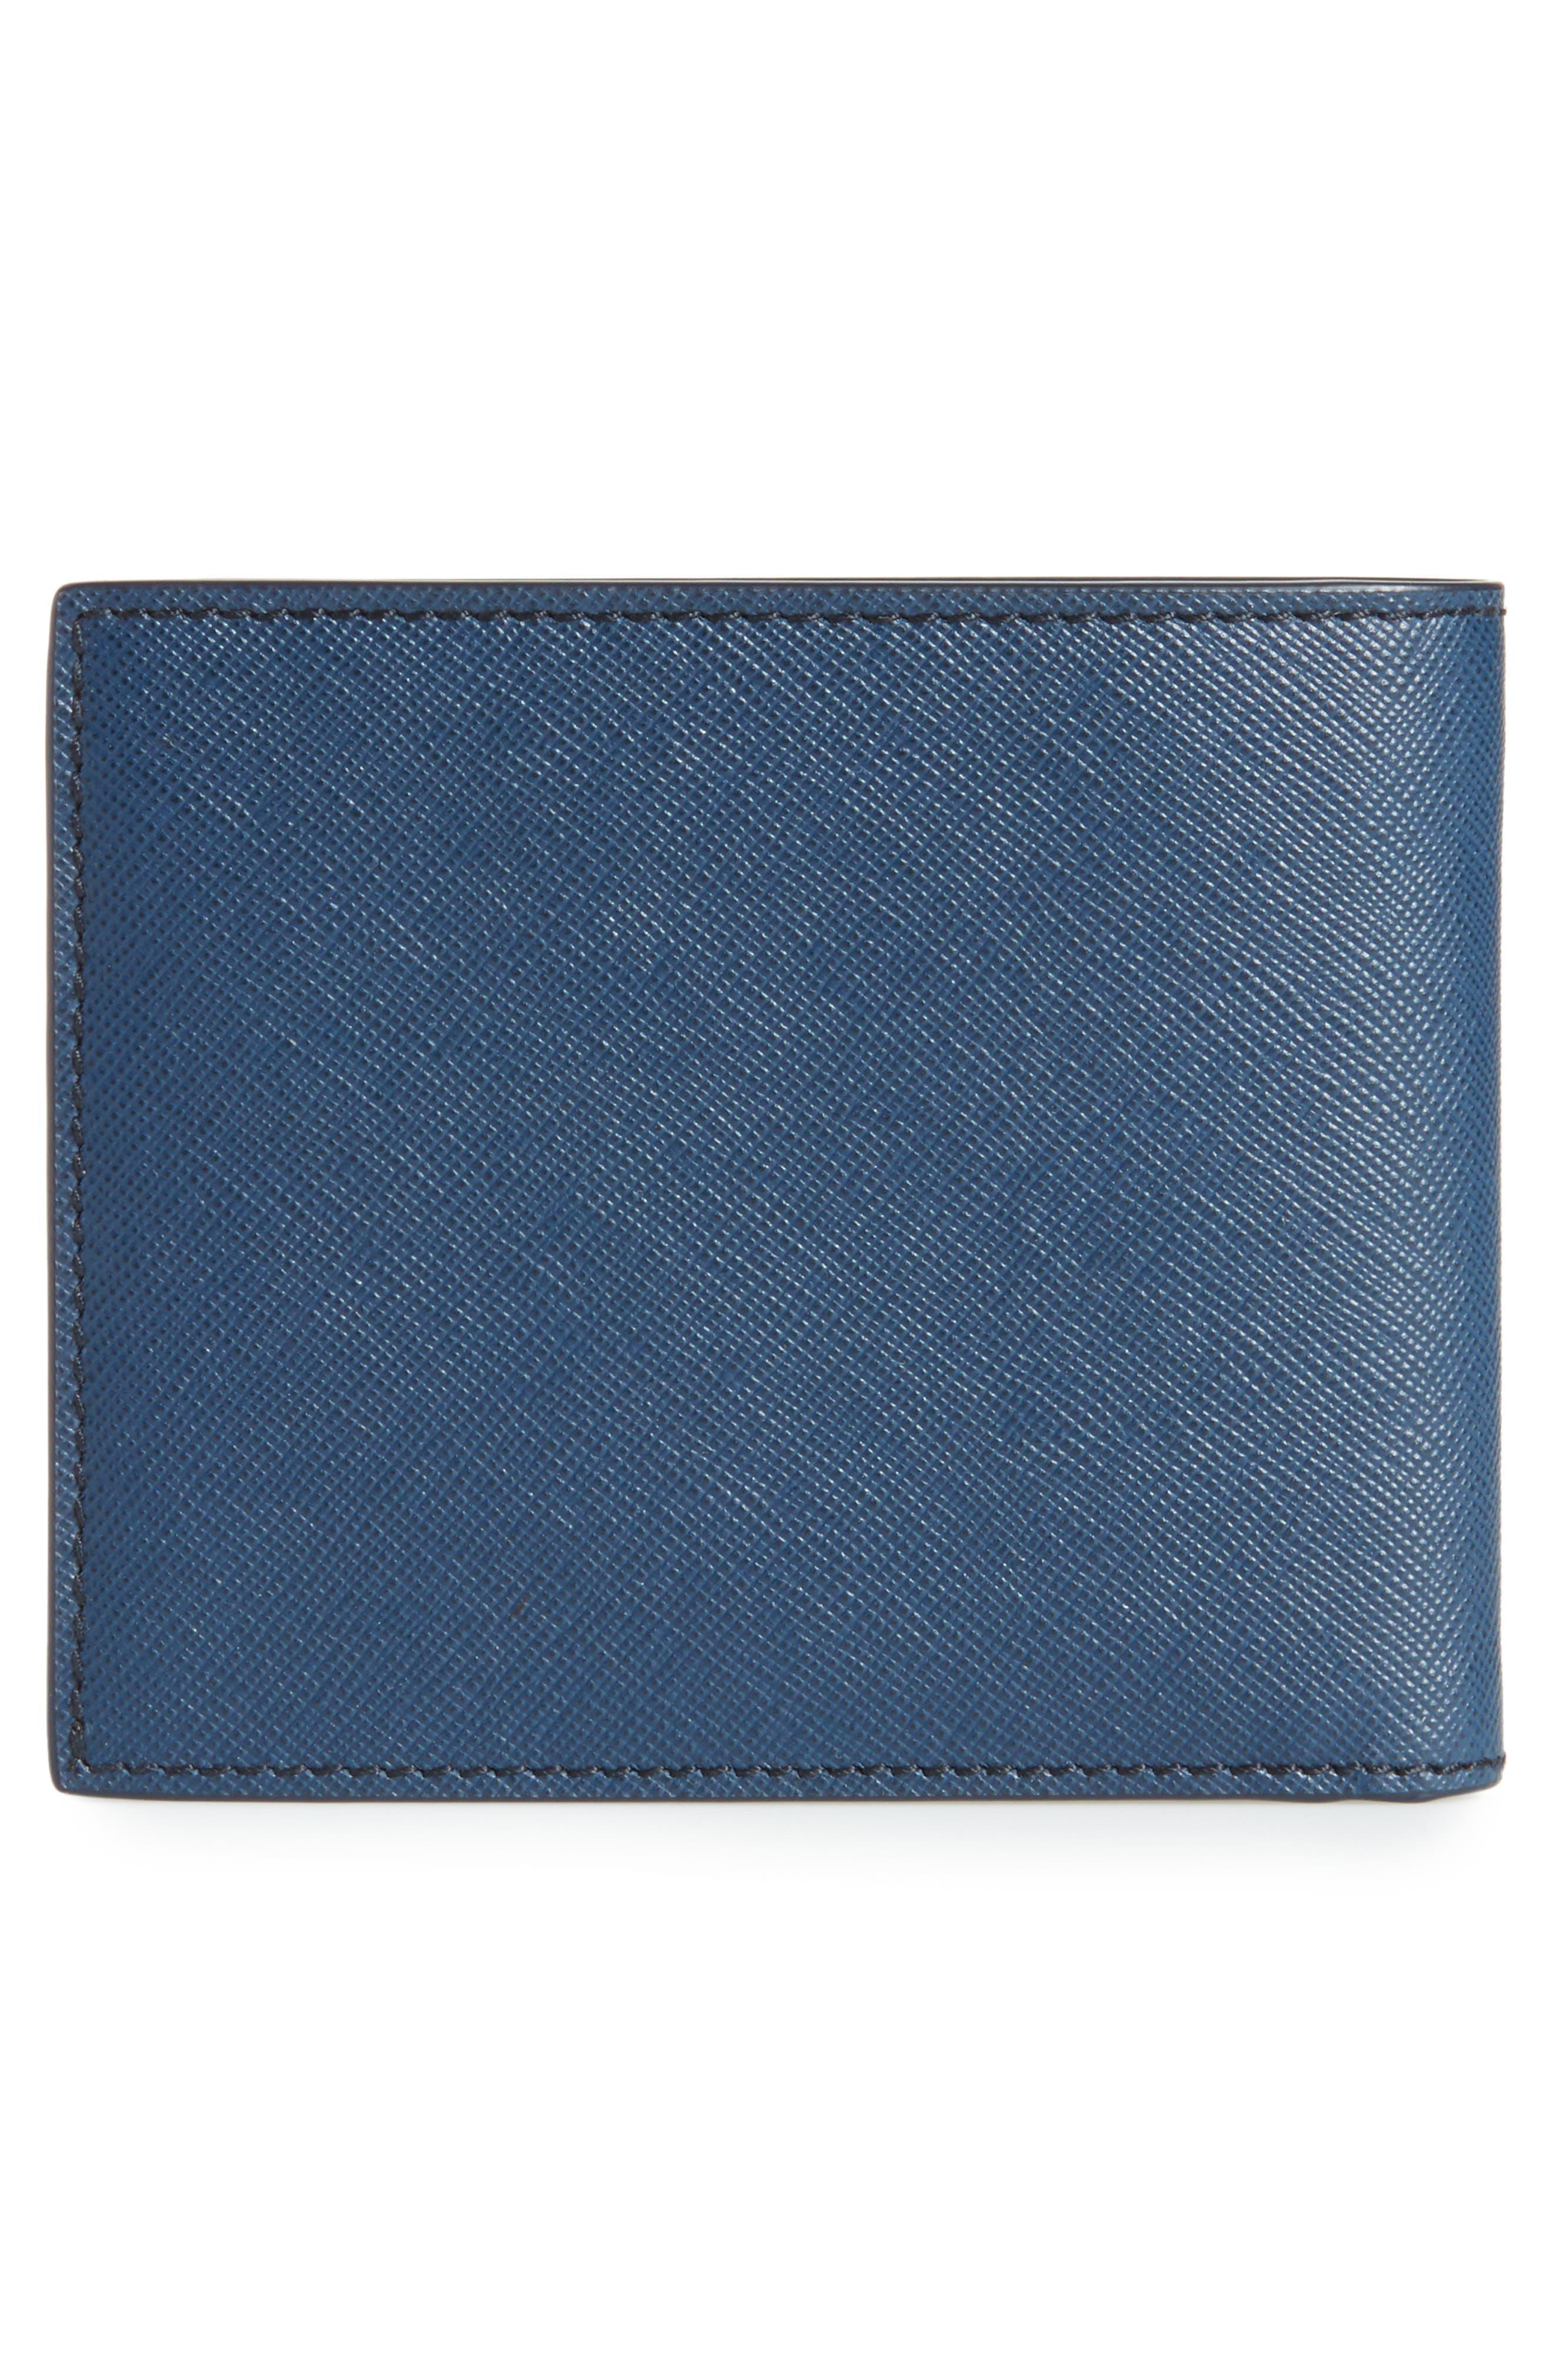 Sartorial Leather Wallet,                             Alternate thumbnail 3, color,                             INDIGO